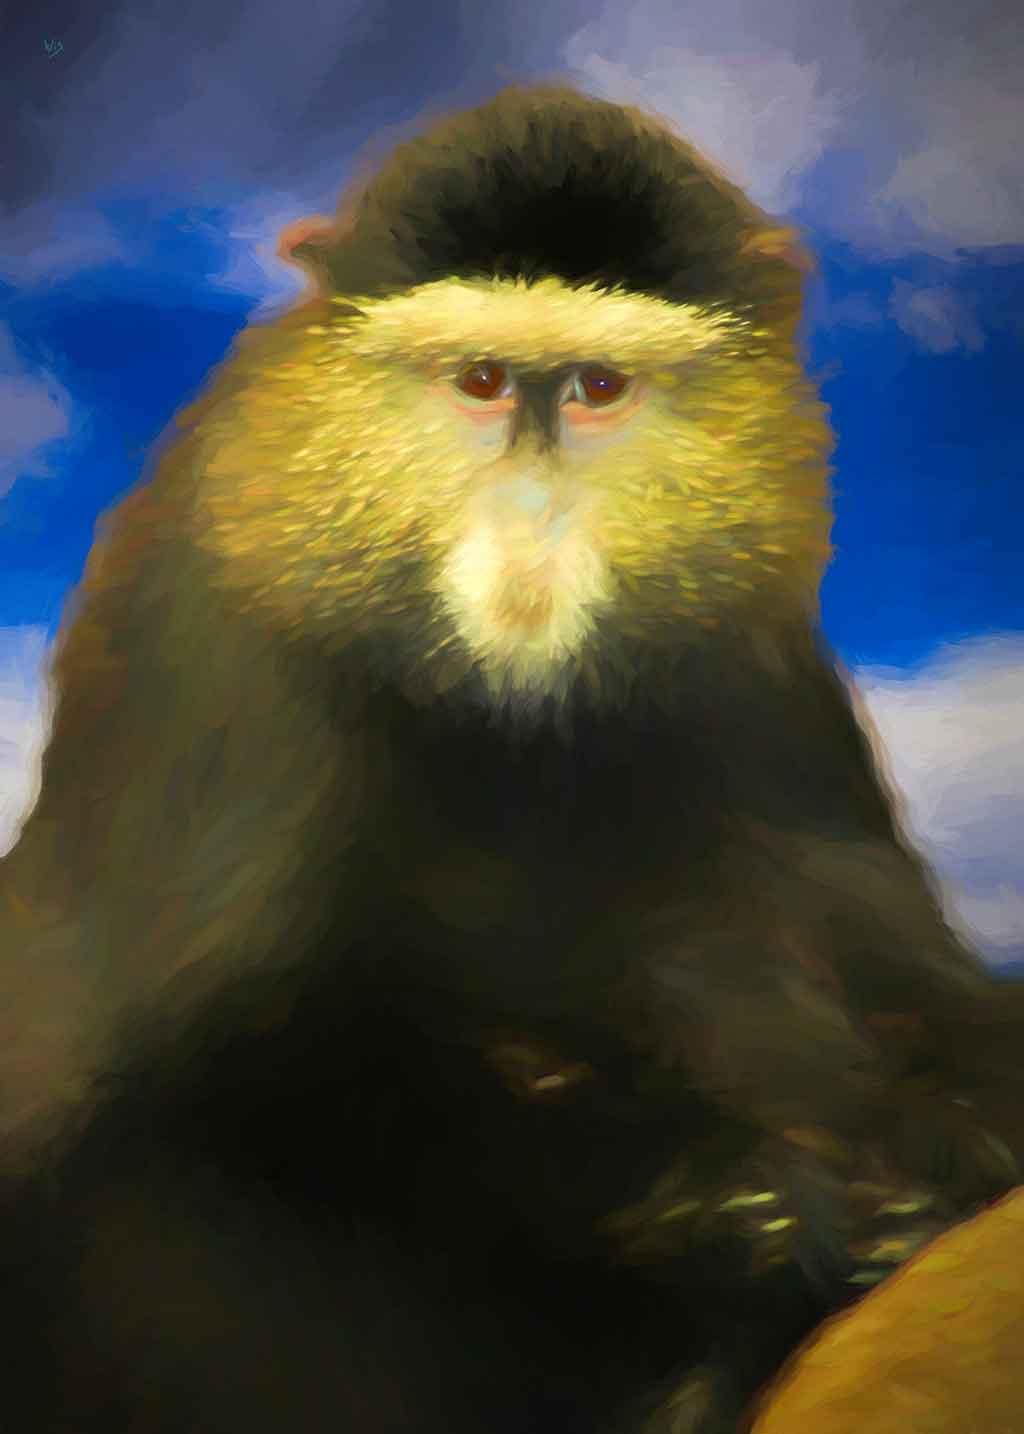 Monkey Portraits in Paintings